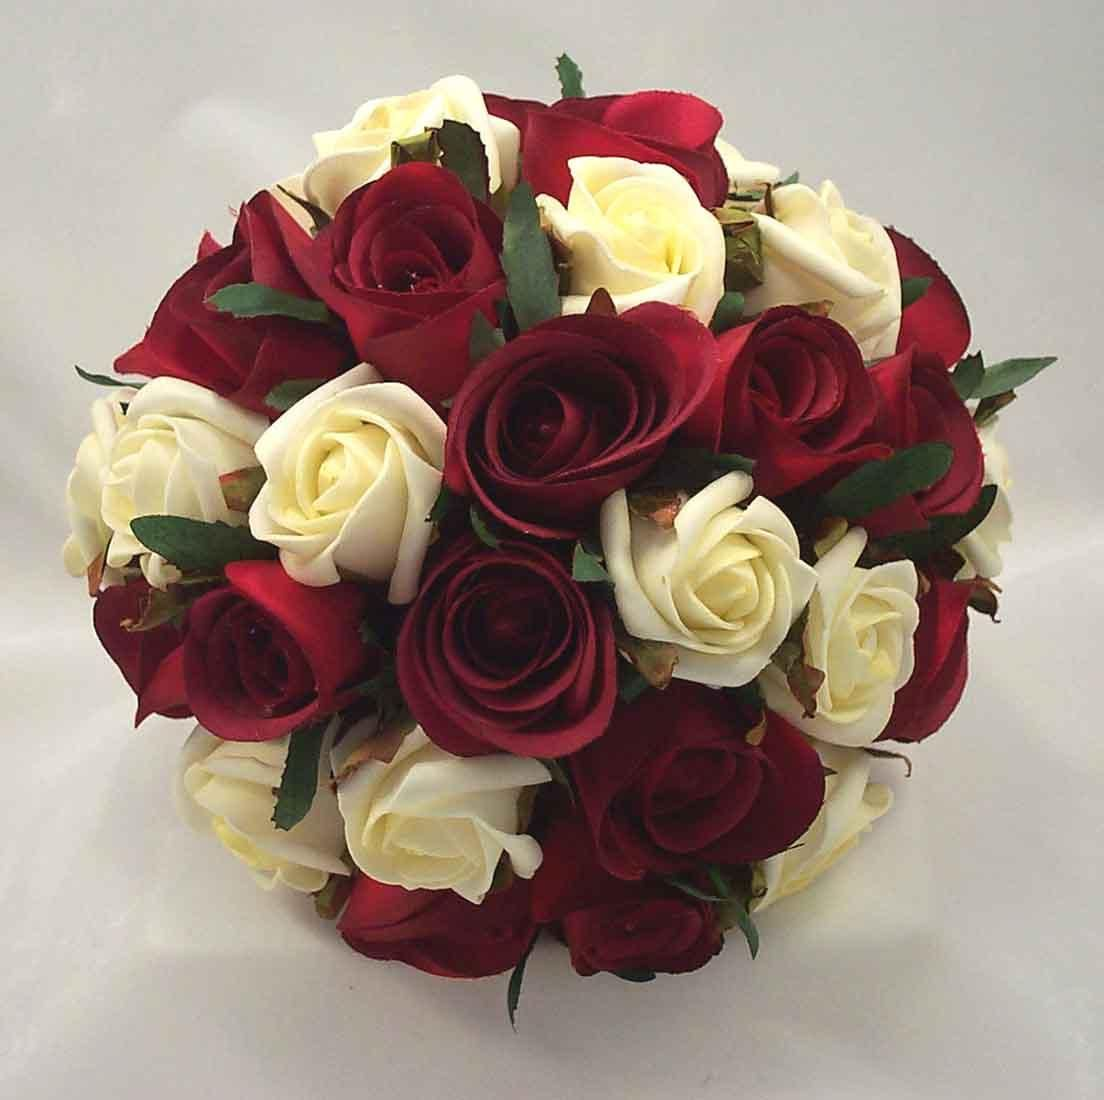 Burgundy ivory rose bouquet wedding flowers bridal ivory flower burgundy ivory rose bouquet wedding flowers bridal izmirmasajfo Choice Image